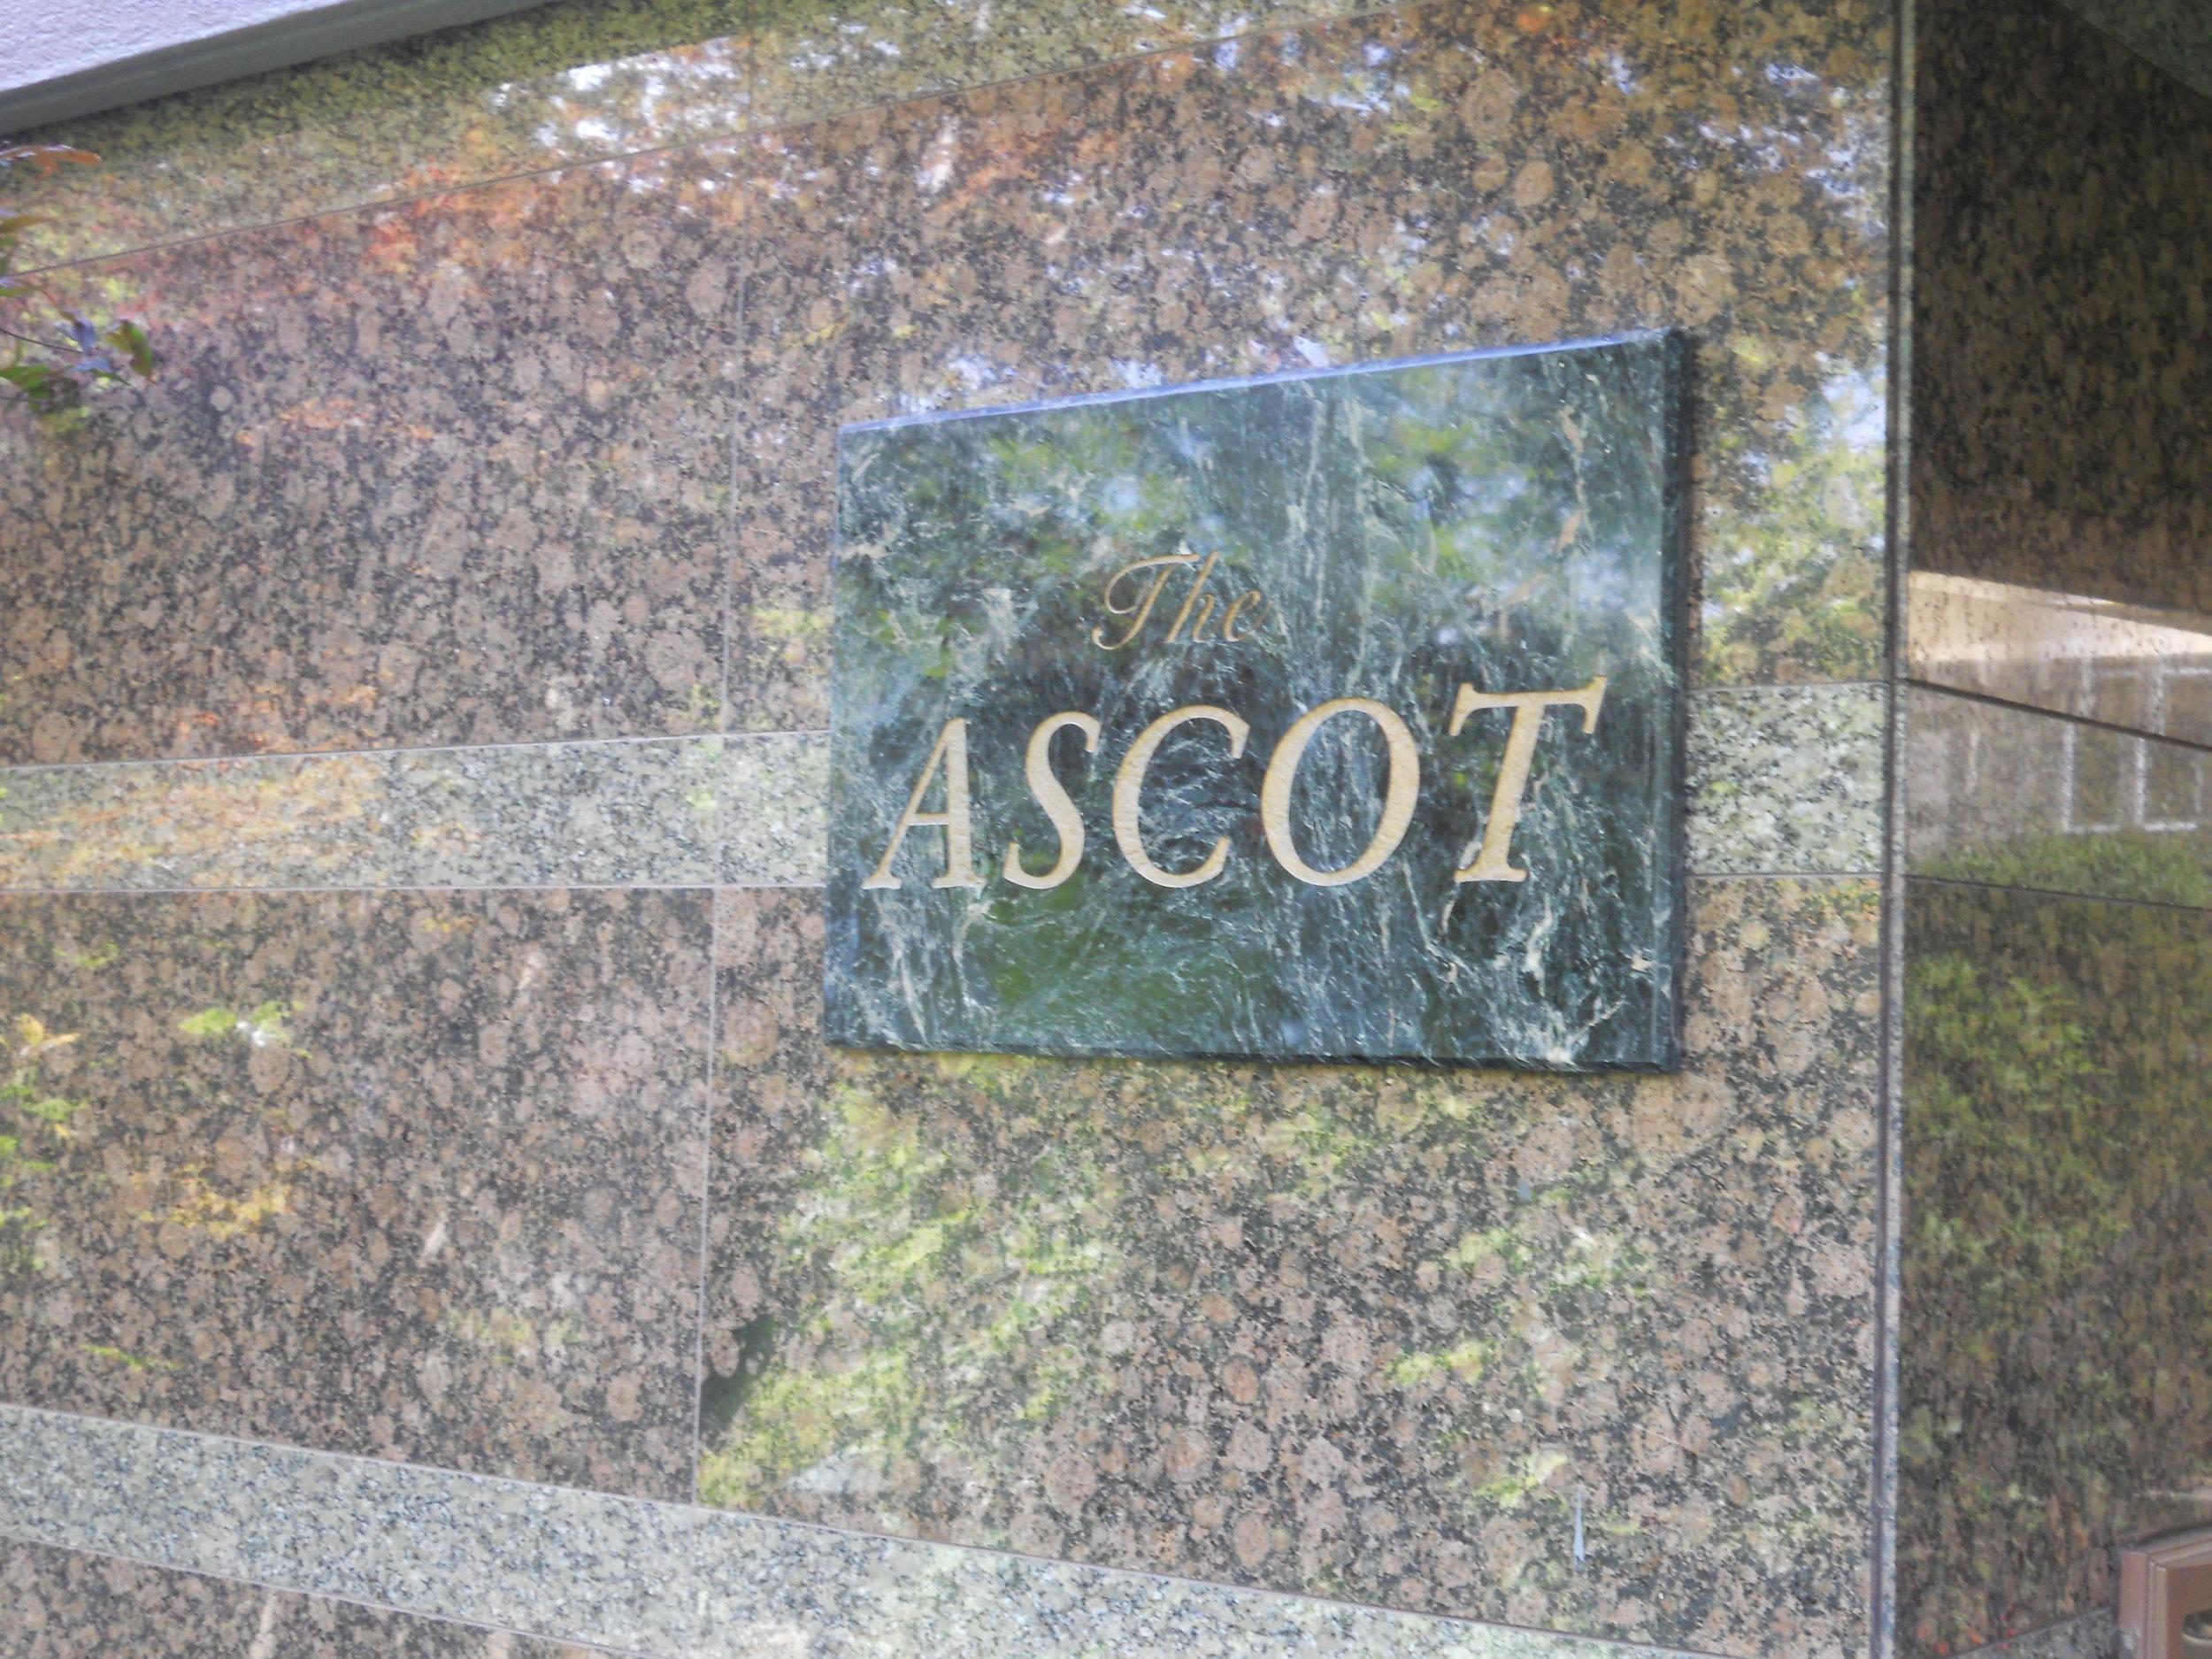 The Ascot (1).JPG